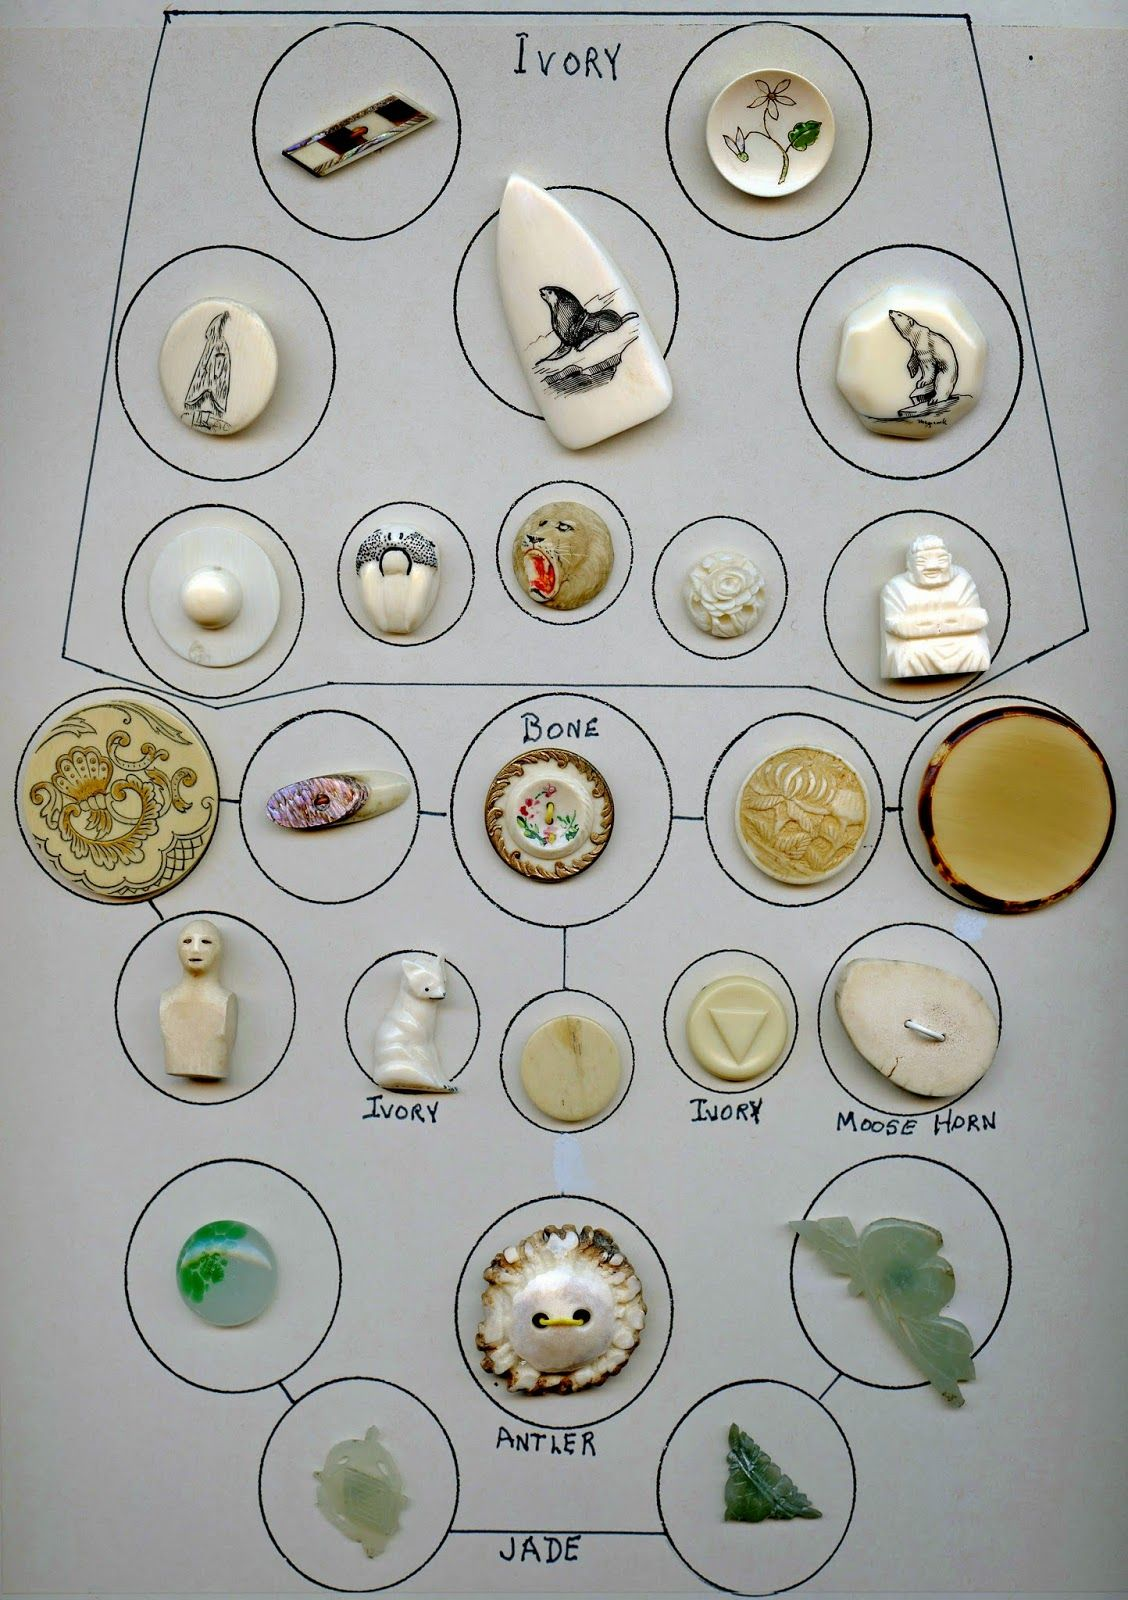 Pegs Button Blog: Ivory Bone Jade buttons card